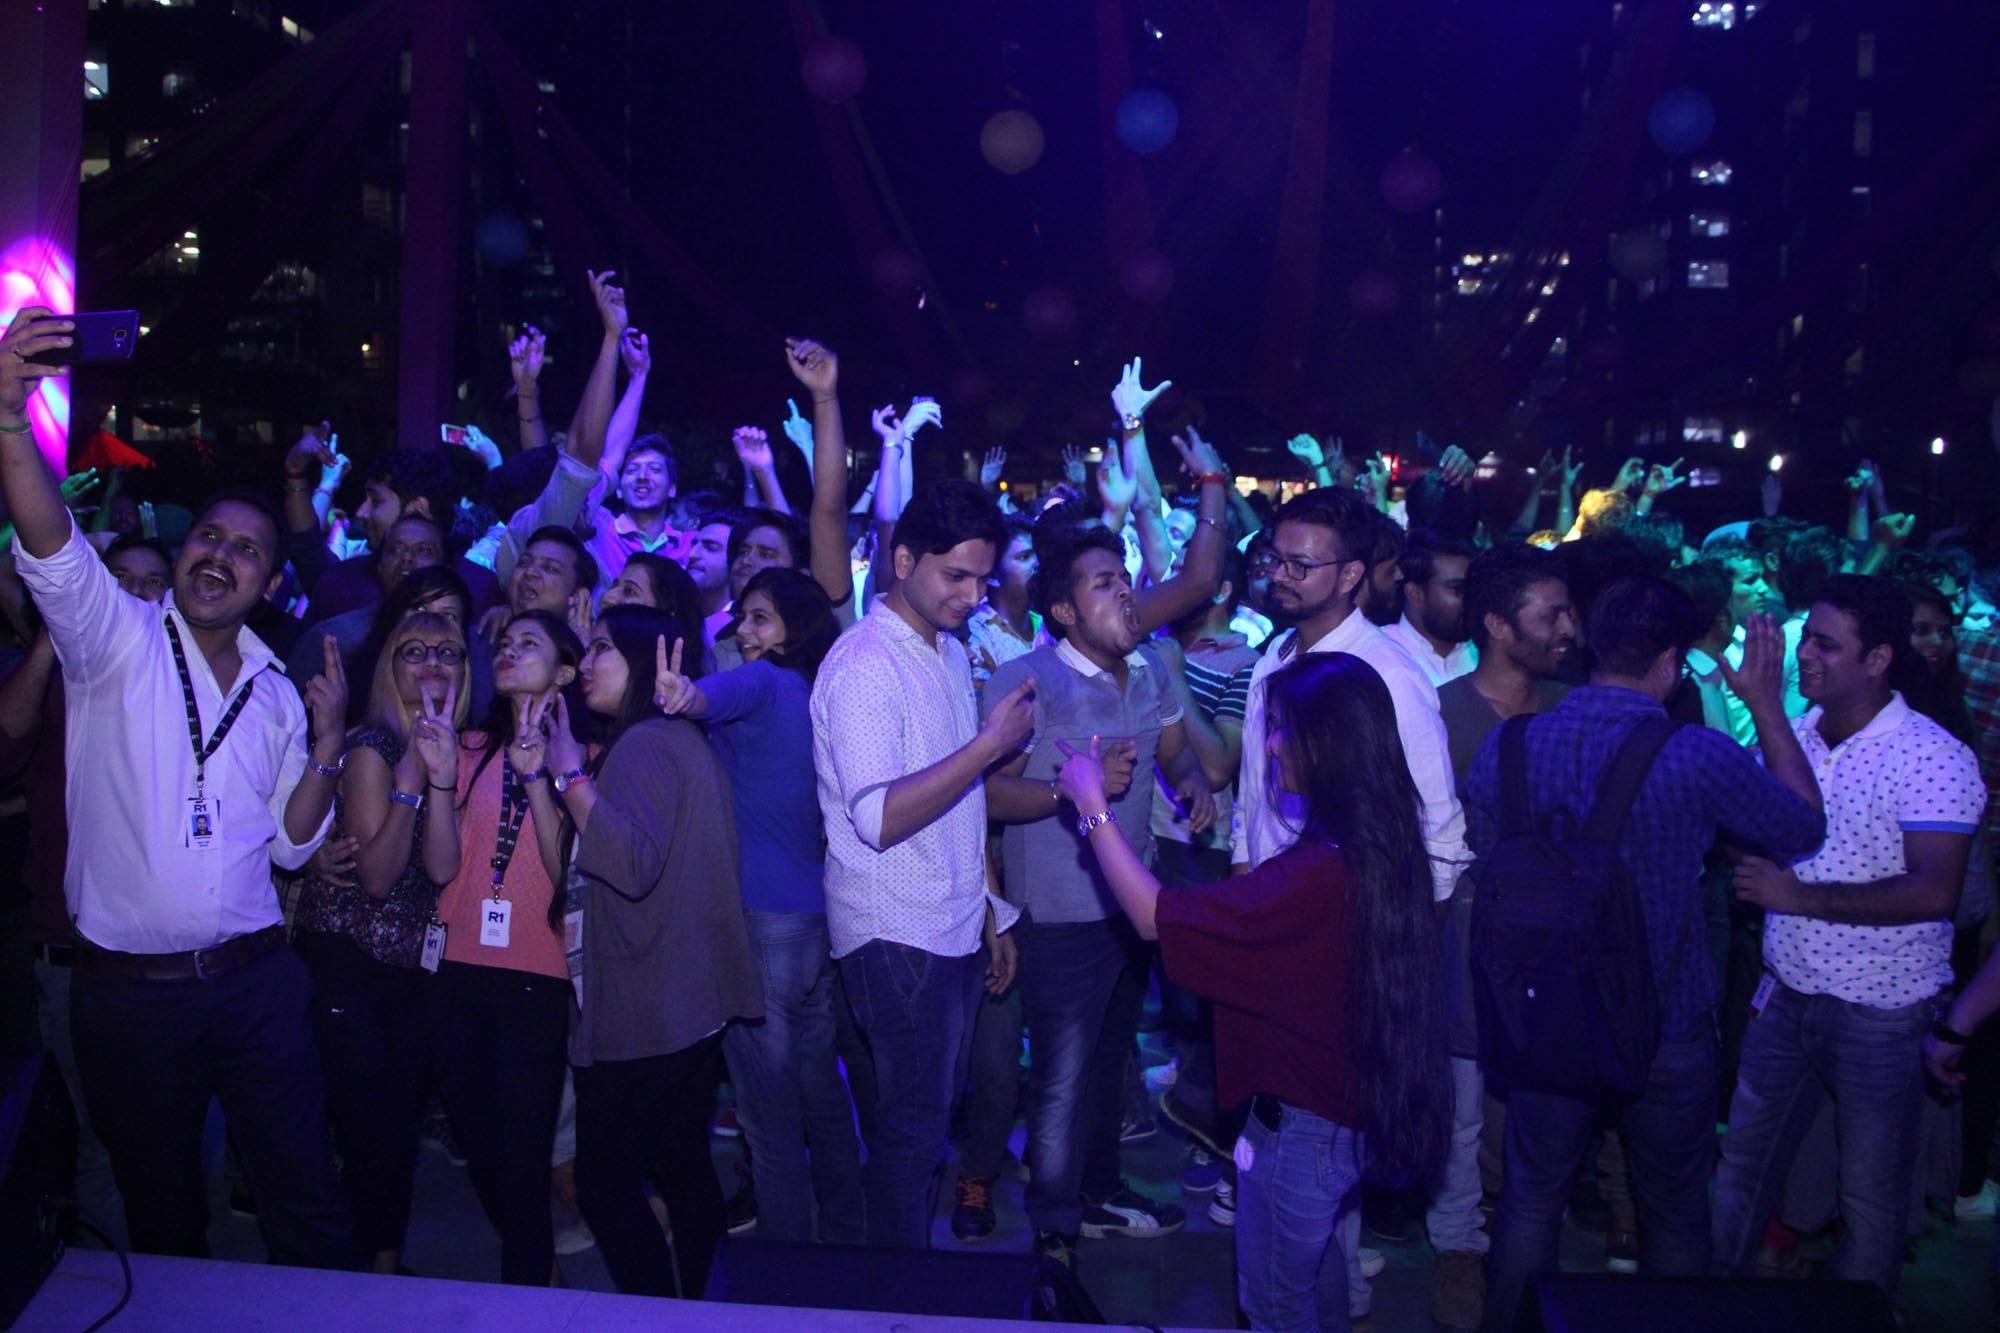 candor-diwali-Noida-135-2.jpg